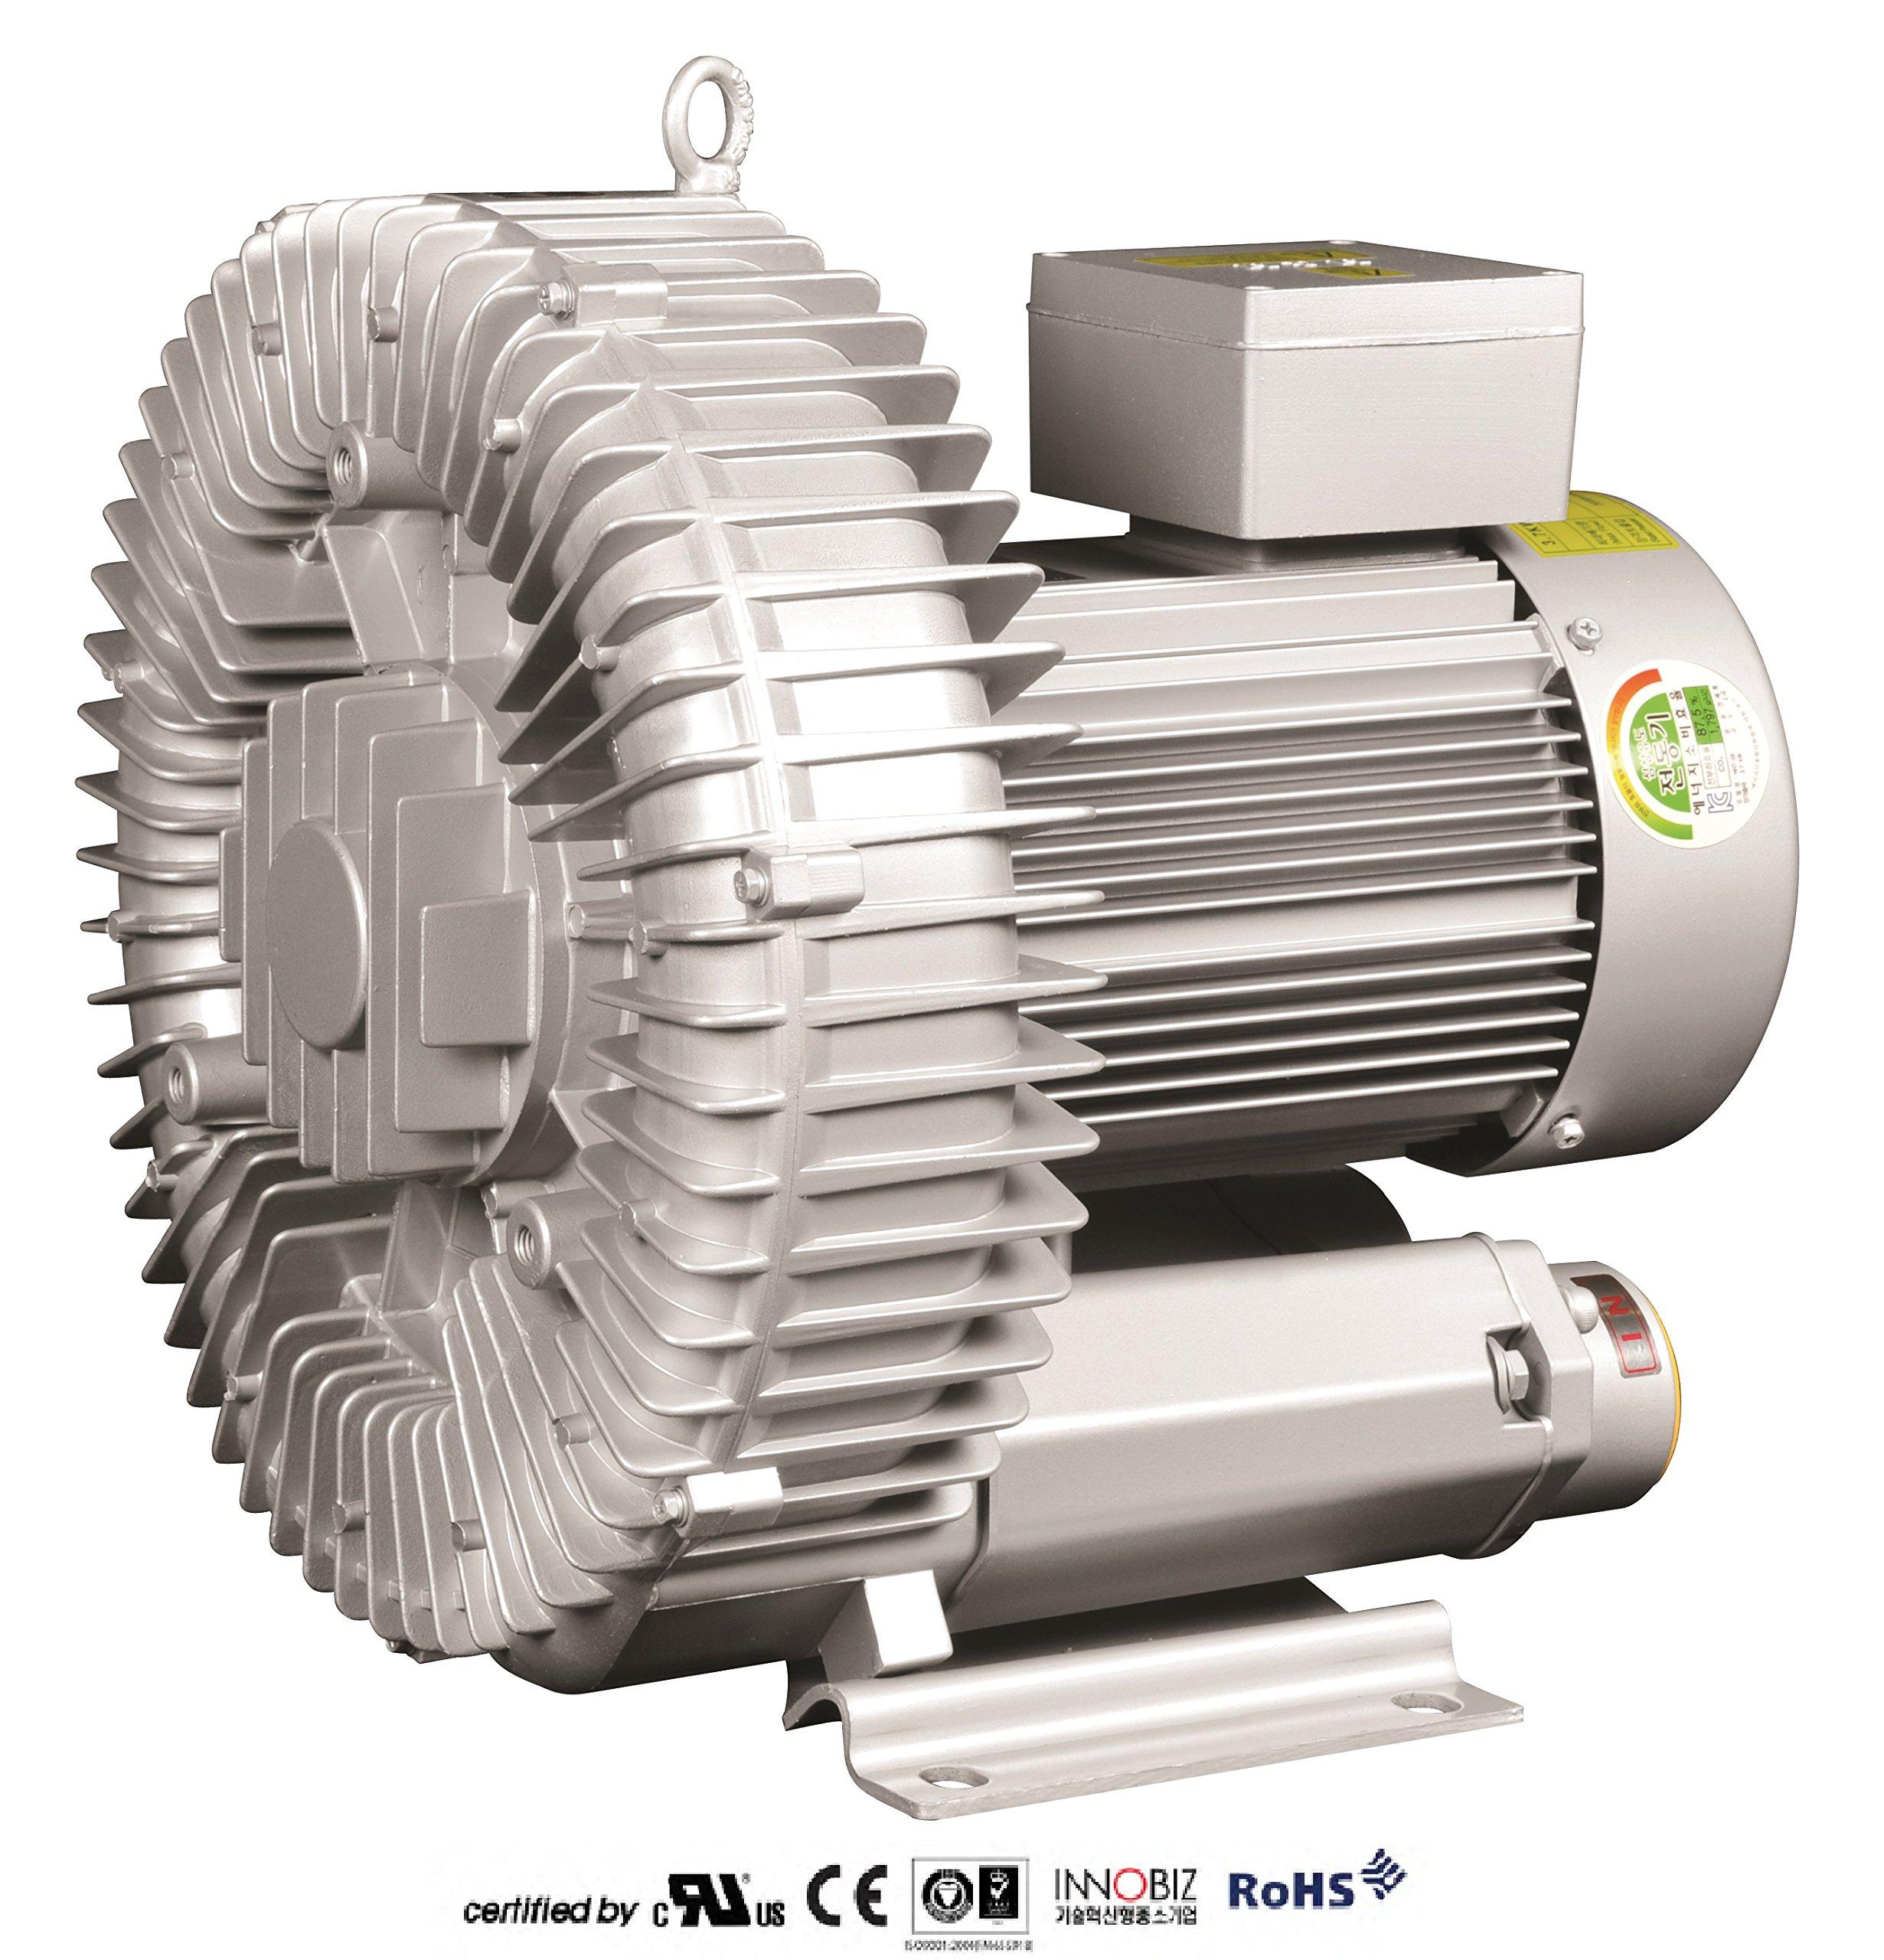 Pacific Regenerative Blower PB-500 (HRB-500), Ring, Side channel, Vacuum Pressure Blowers